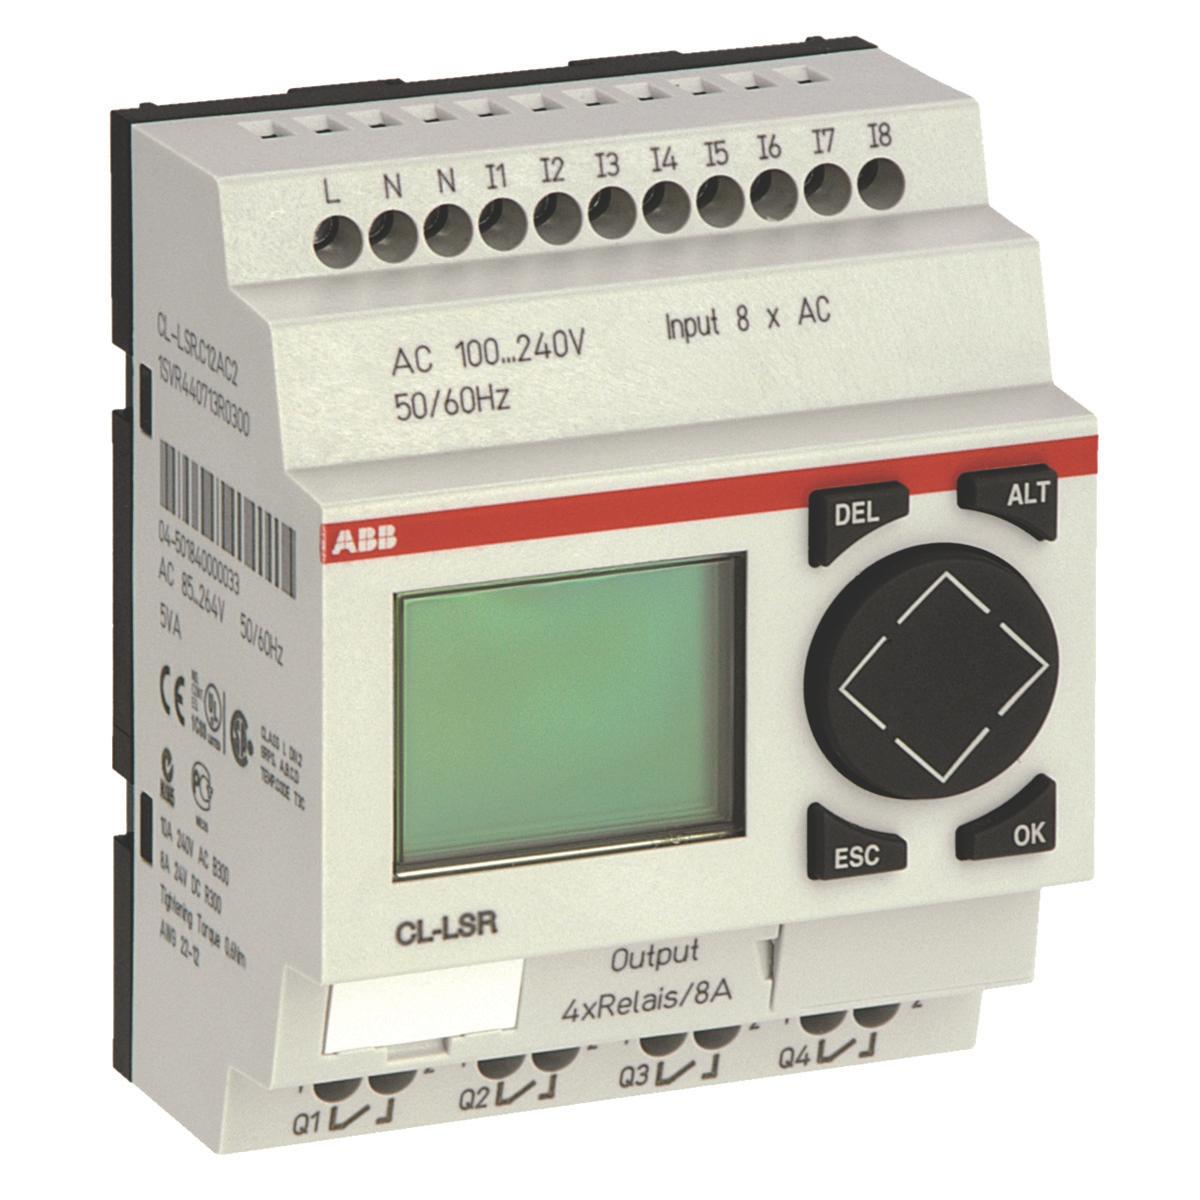 ABB 1SVR440711R0300 Stand Alone Logic Relay